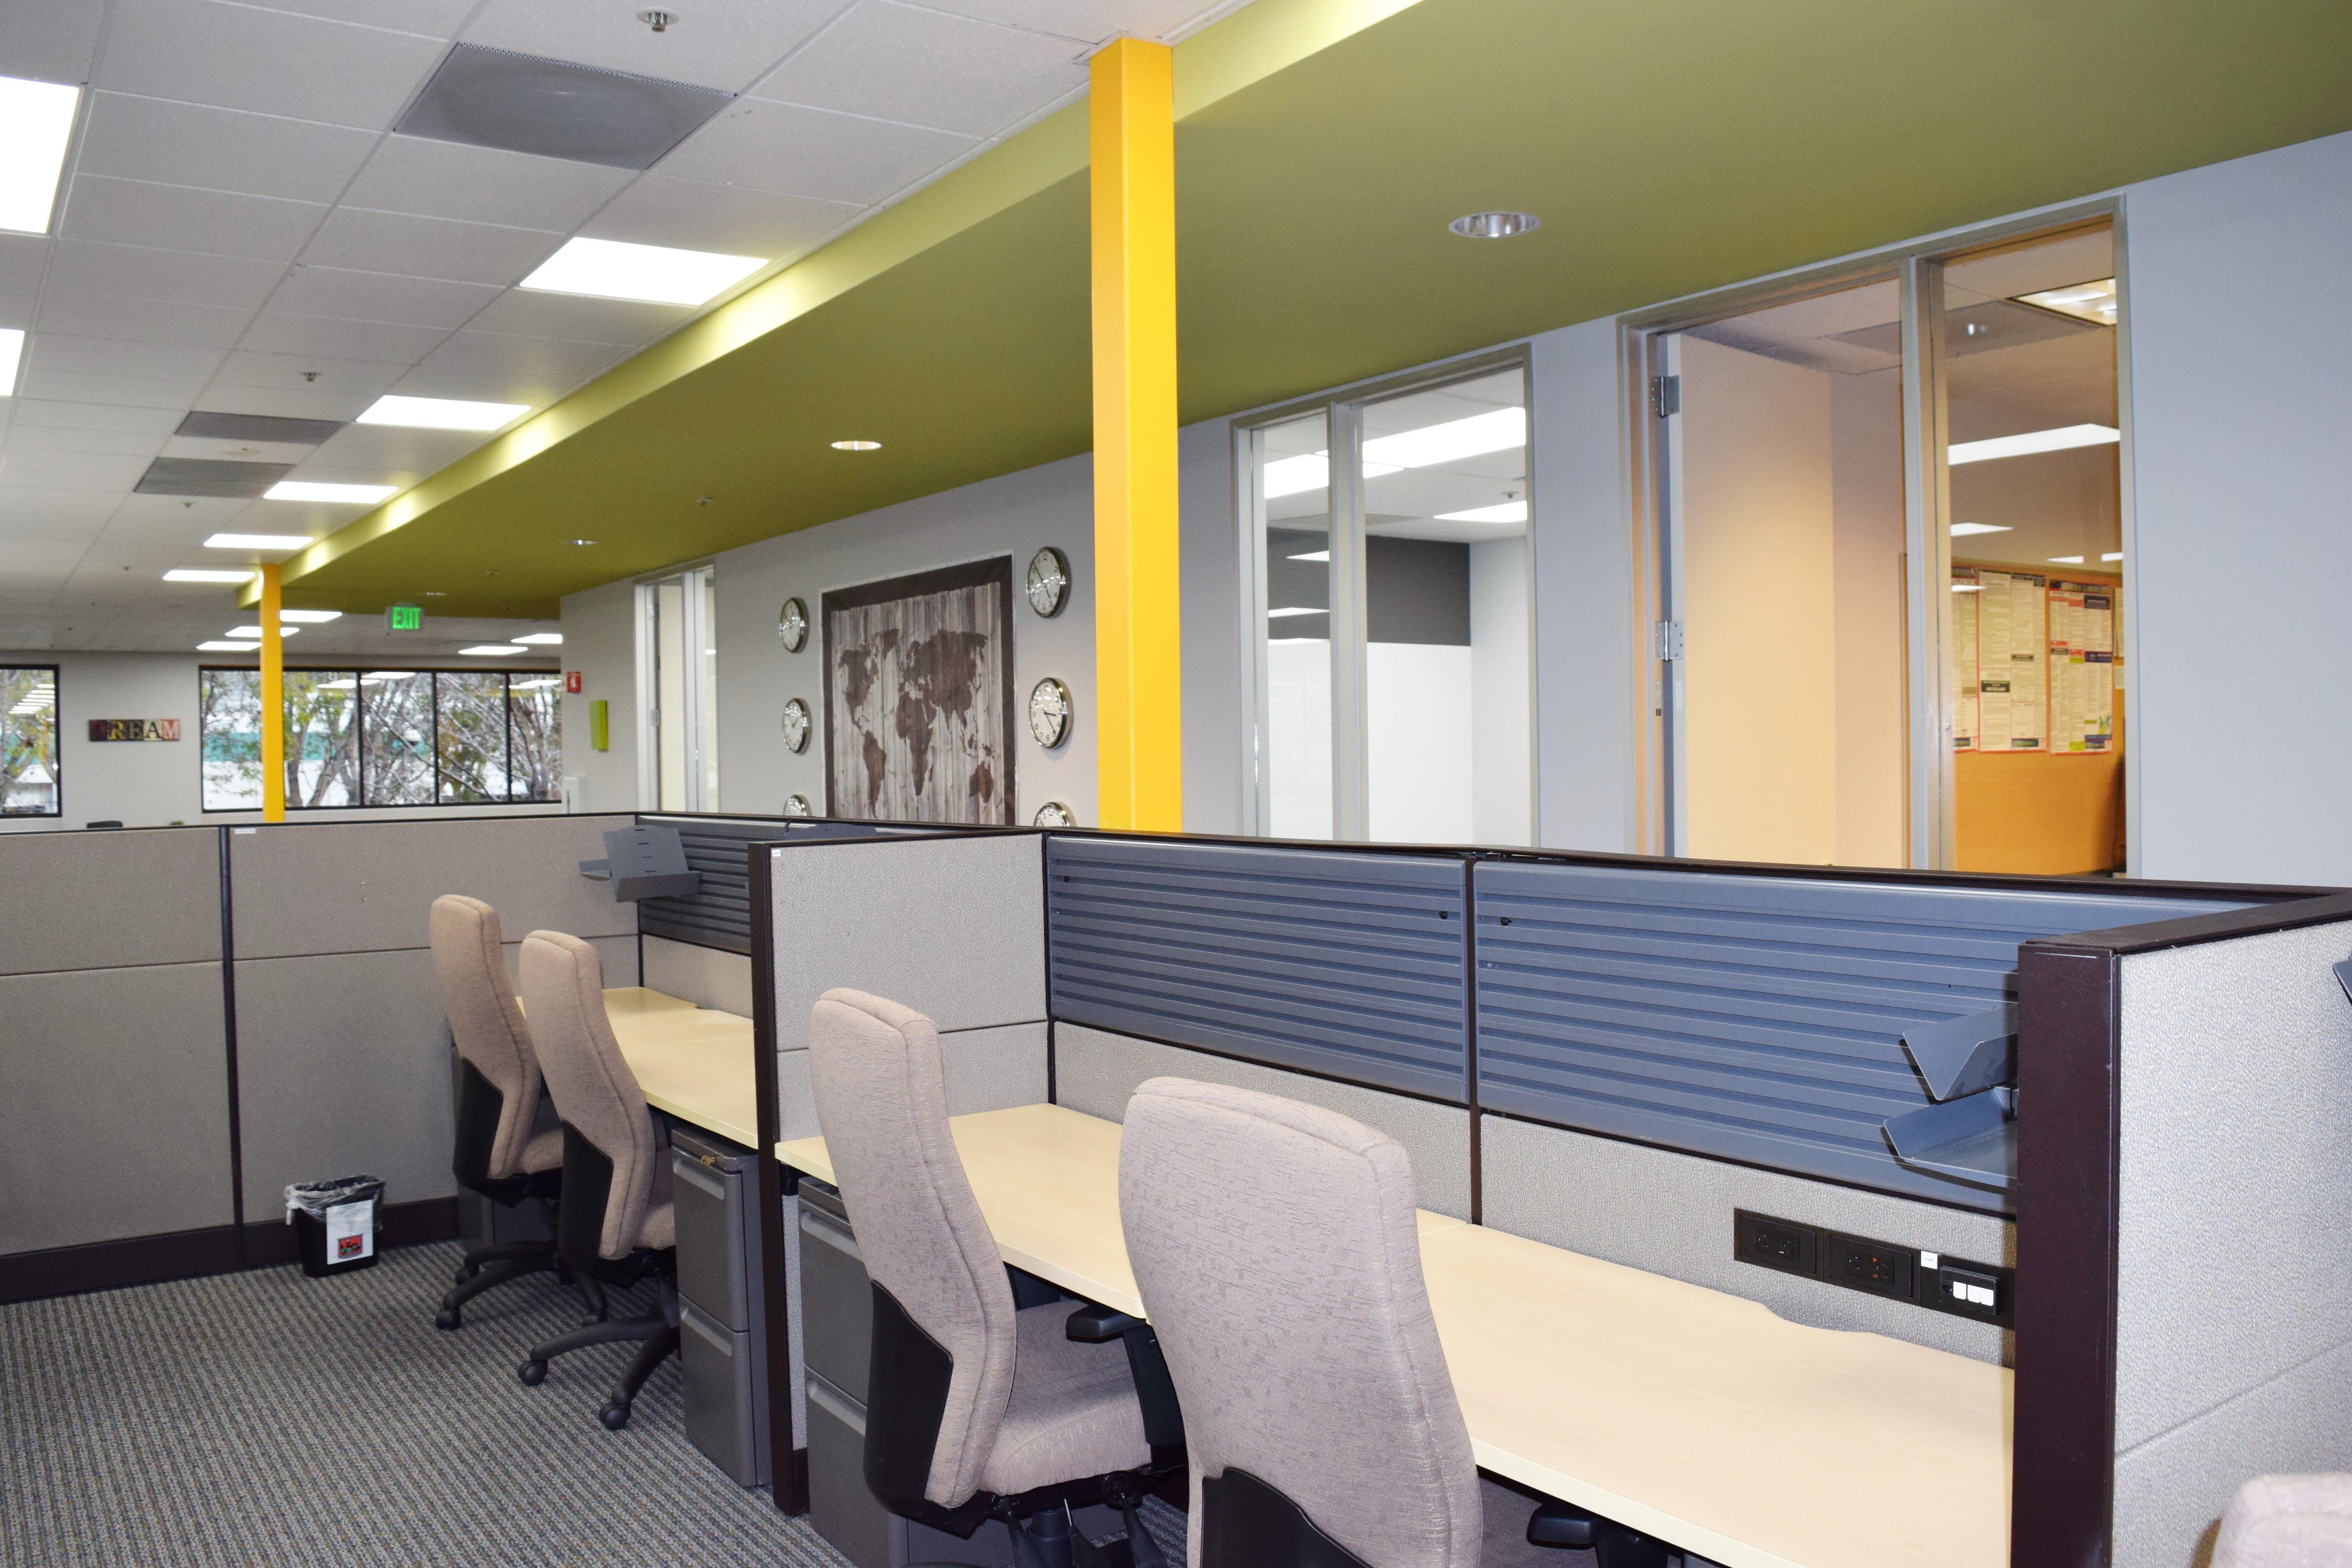 FalconX Incubator Accelerator - Vertual Desk  - Available at FalconX